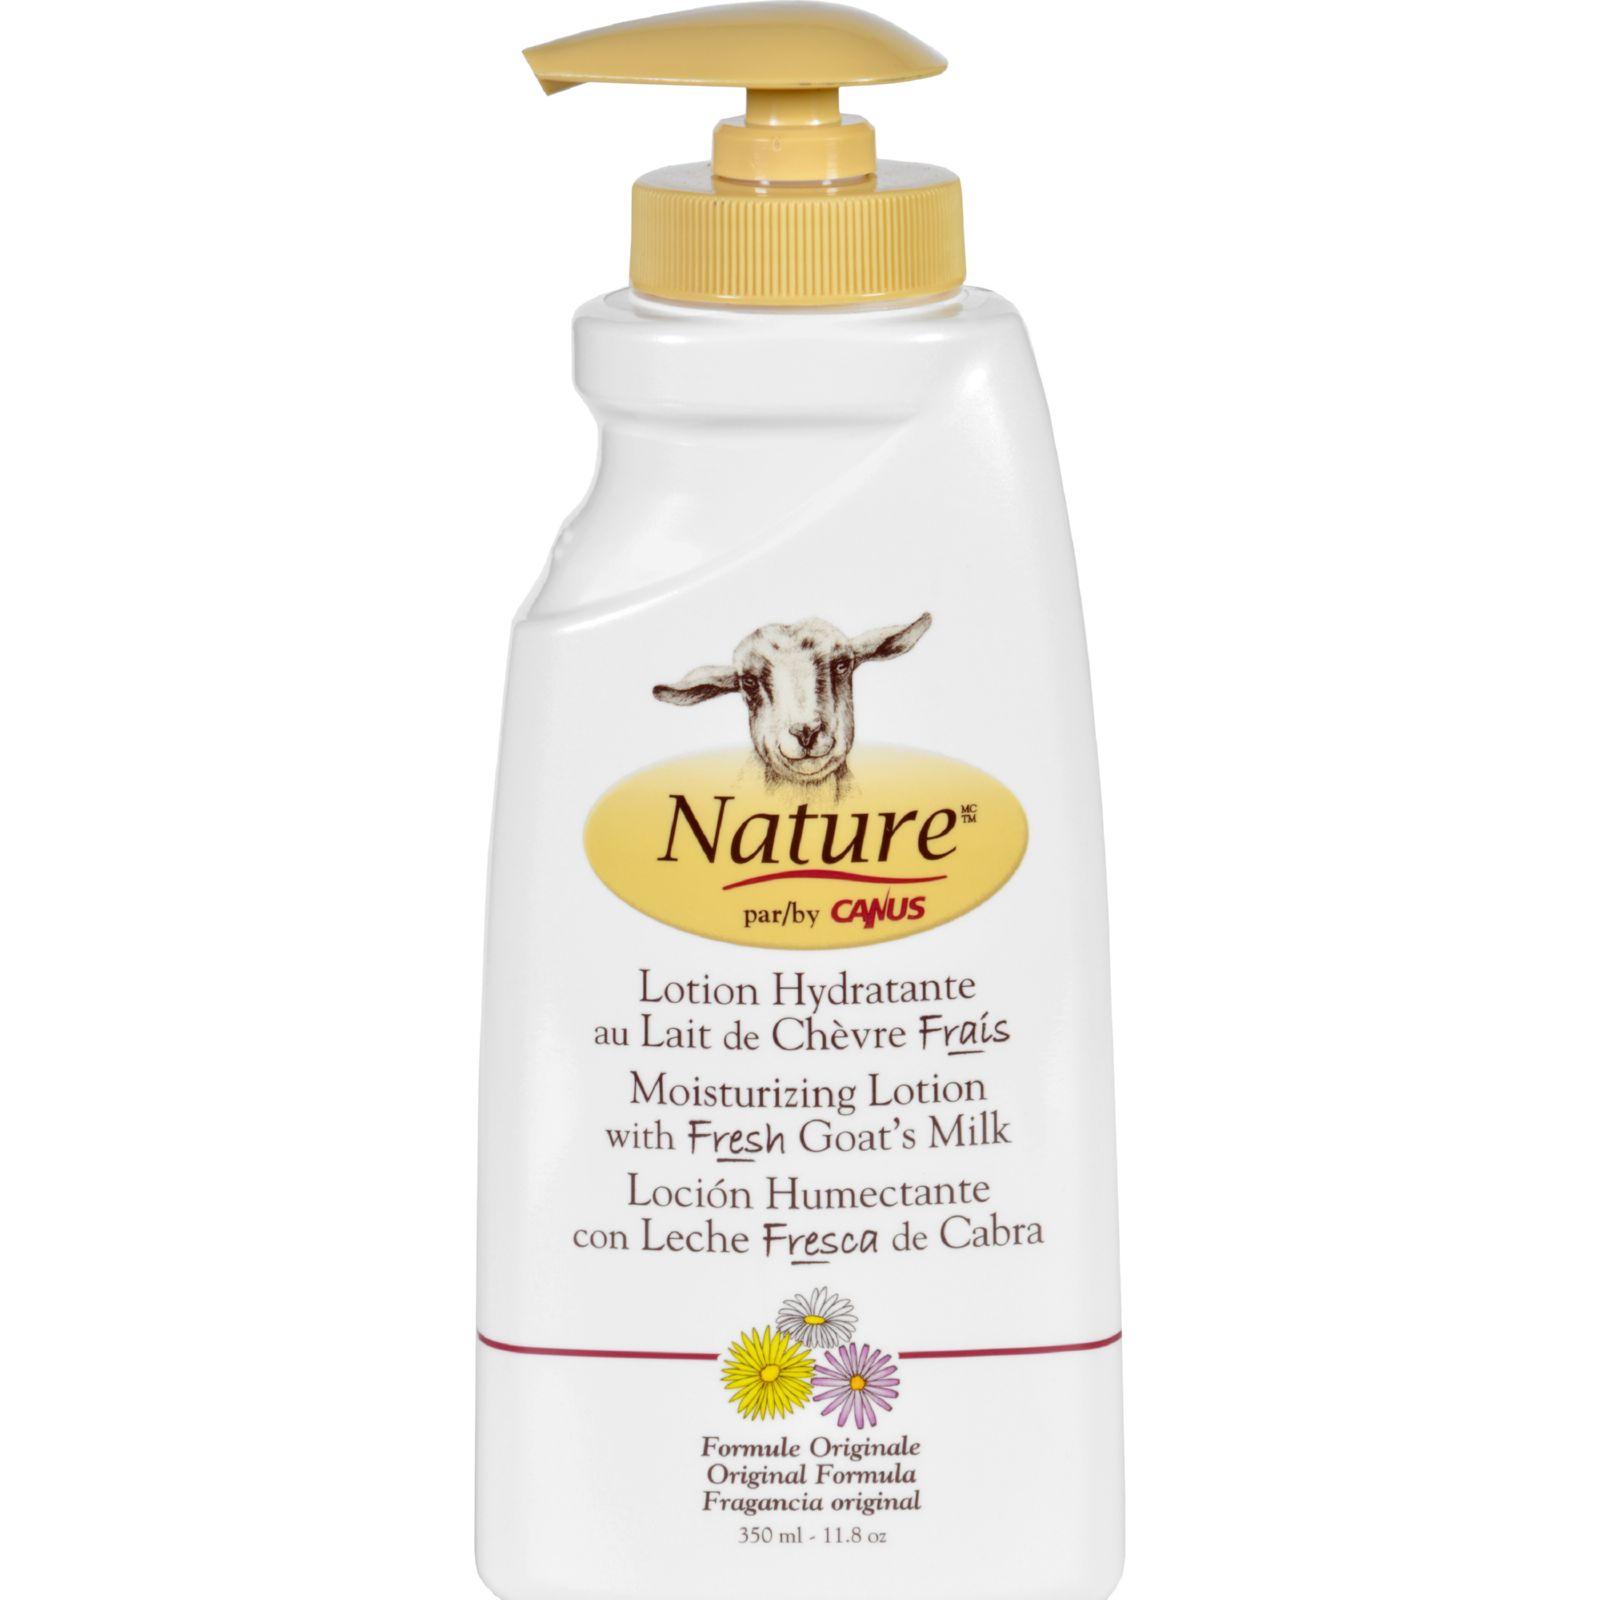 Lotion - Goats Milk - Nature - Original Formula - 11.8 oz